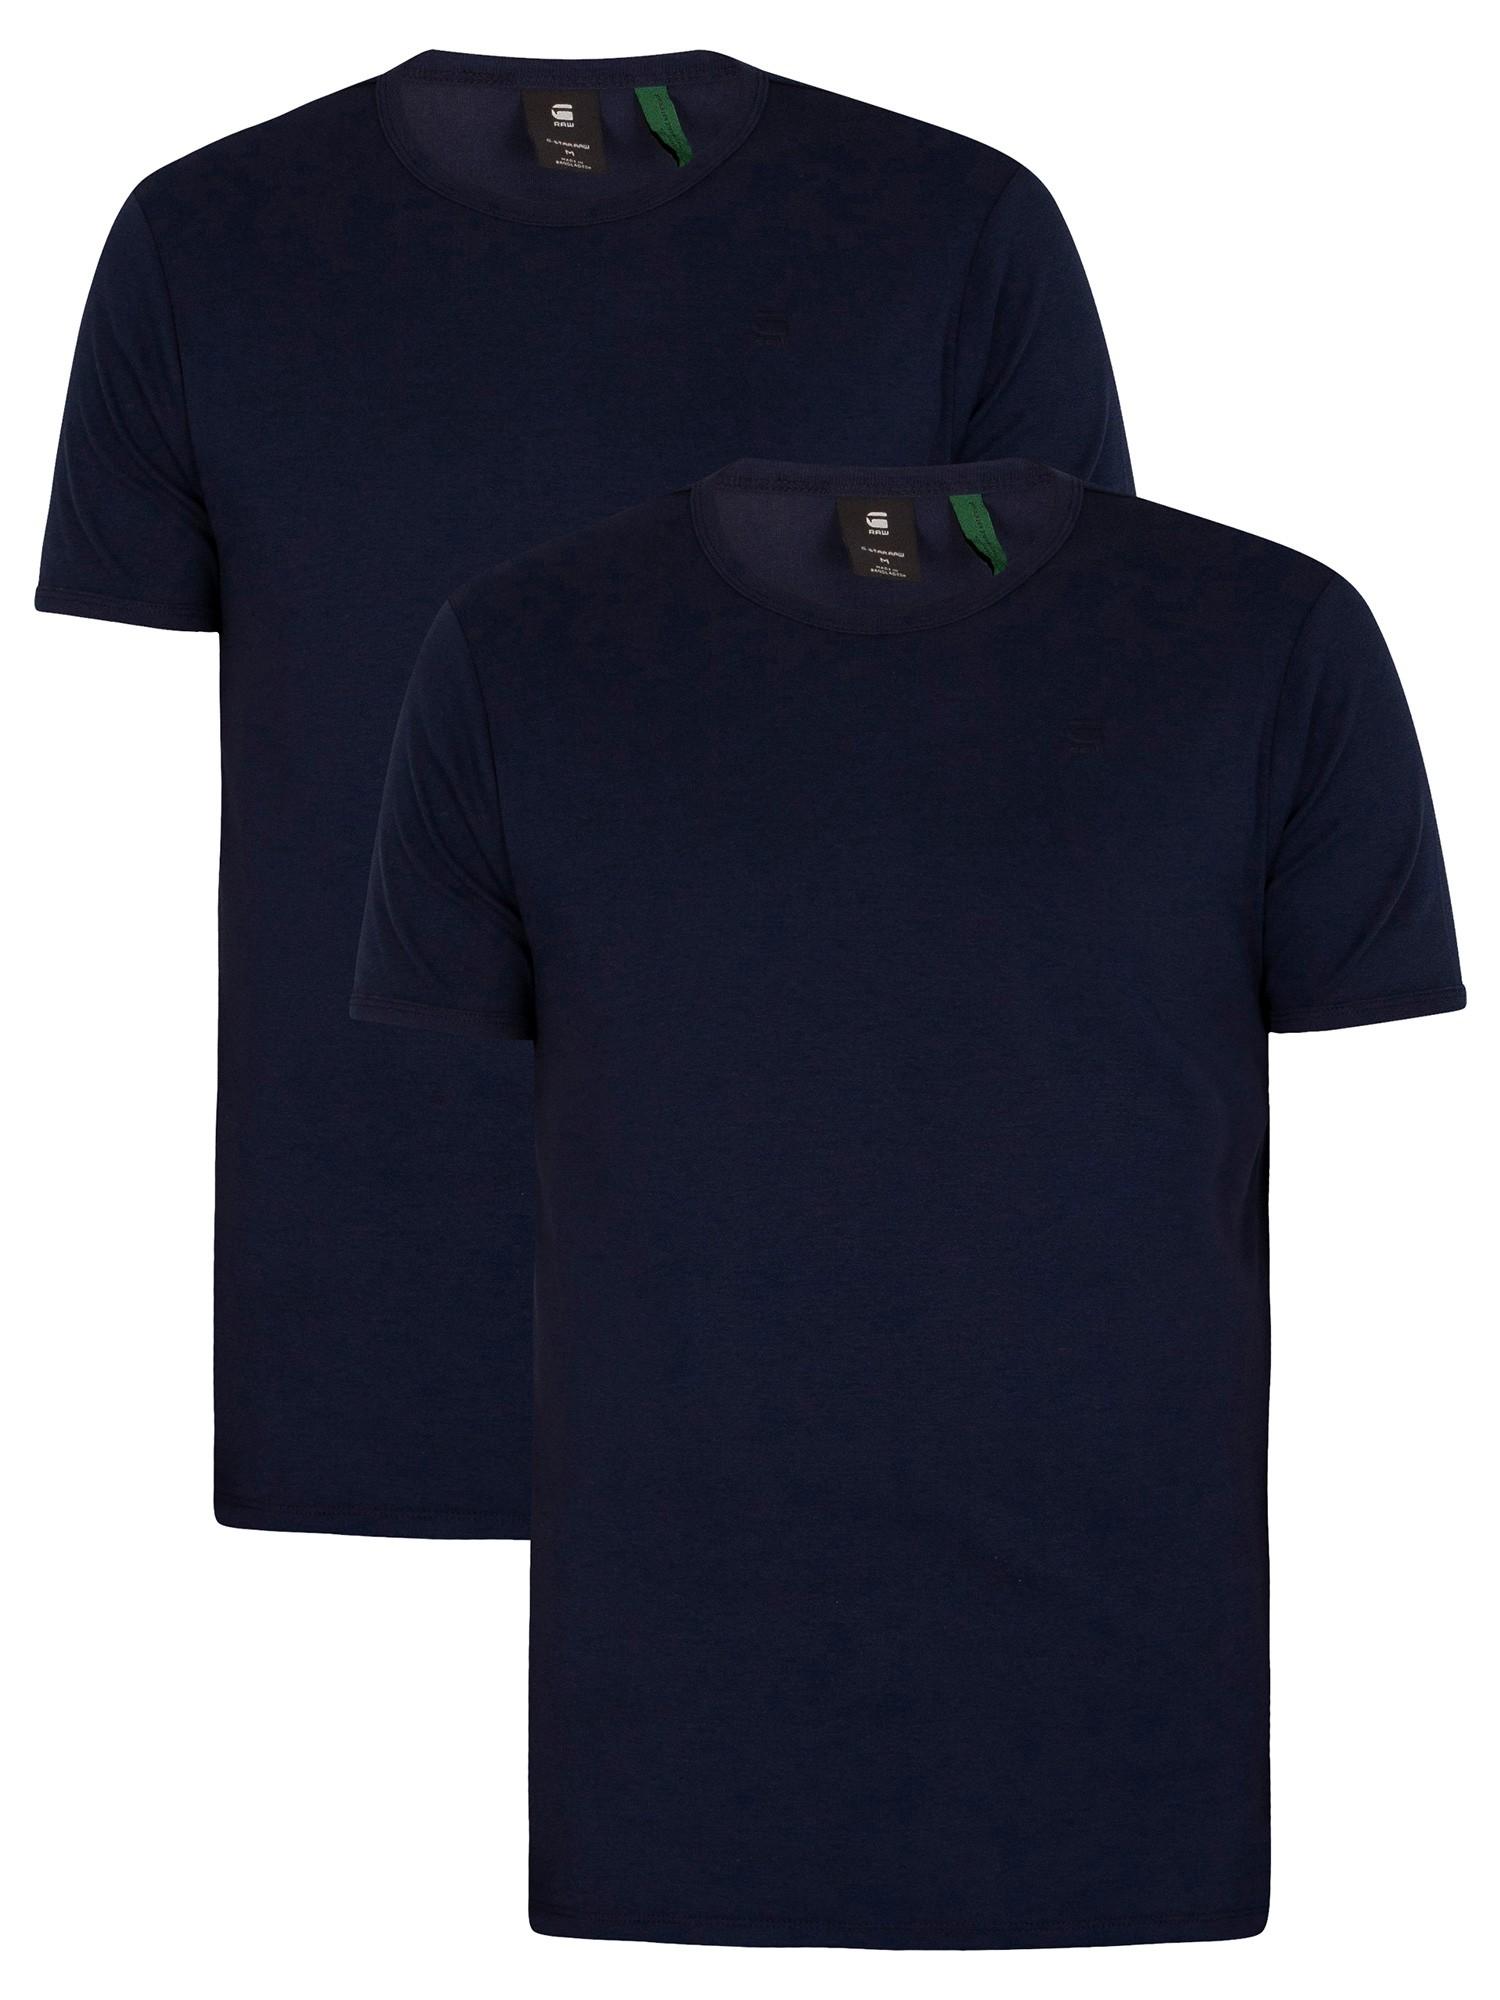 2 Pack Crew Slim T-Shirts